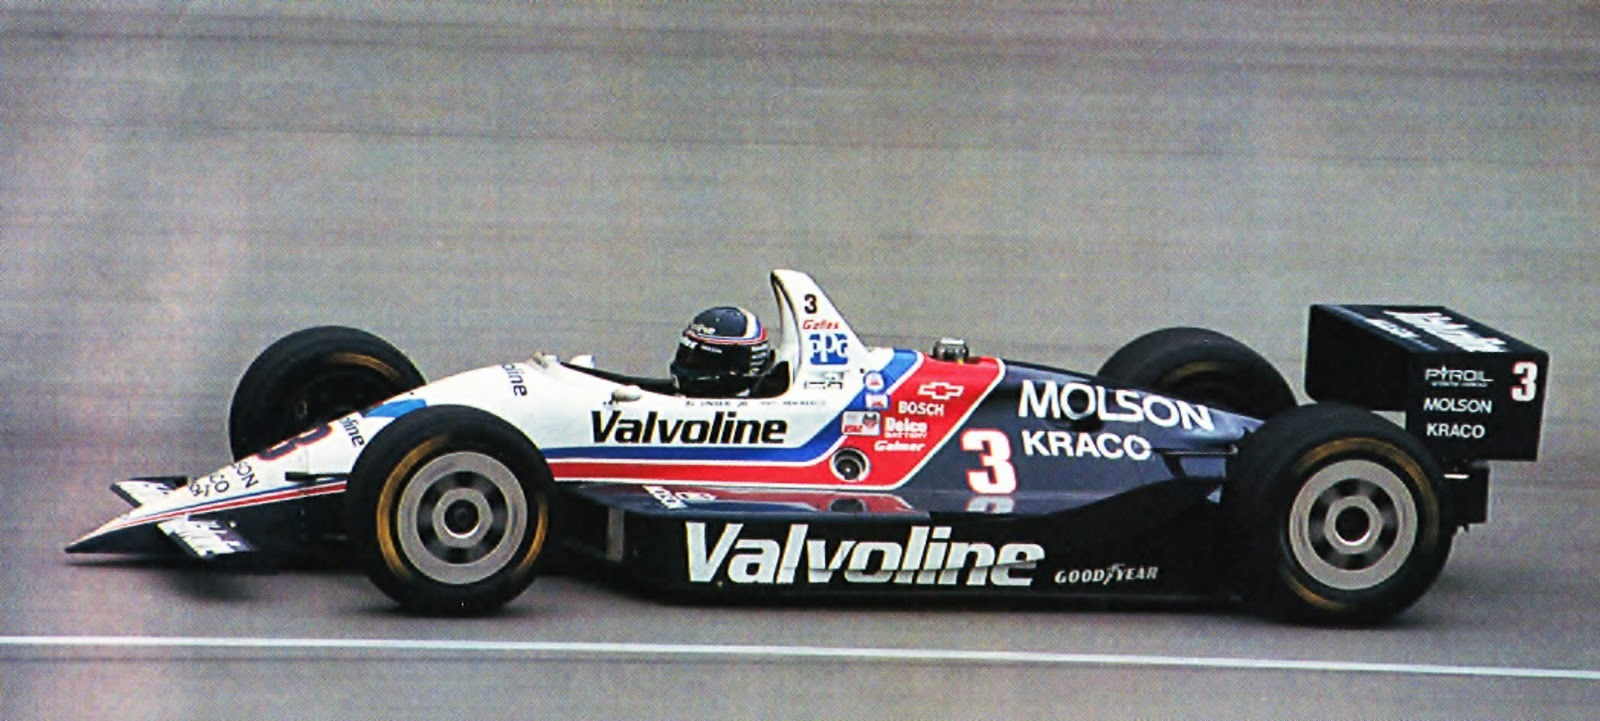 Al Unser Jr 1992 Indy 500